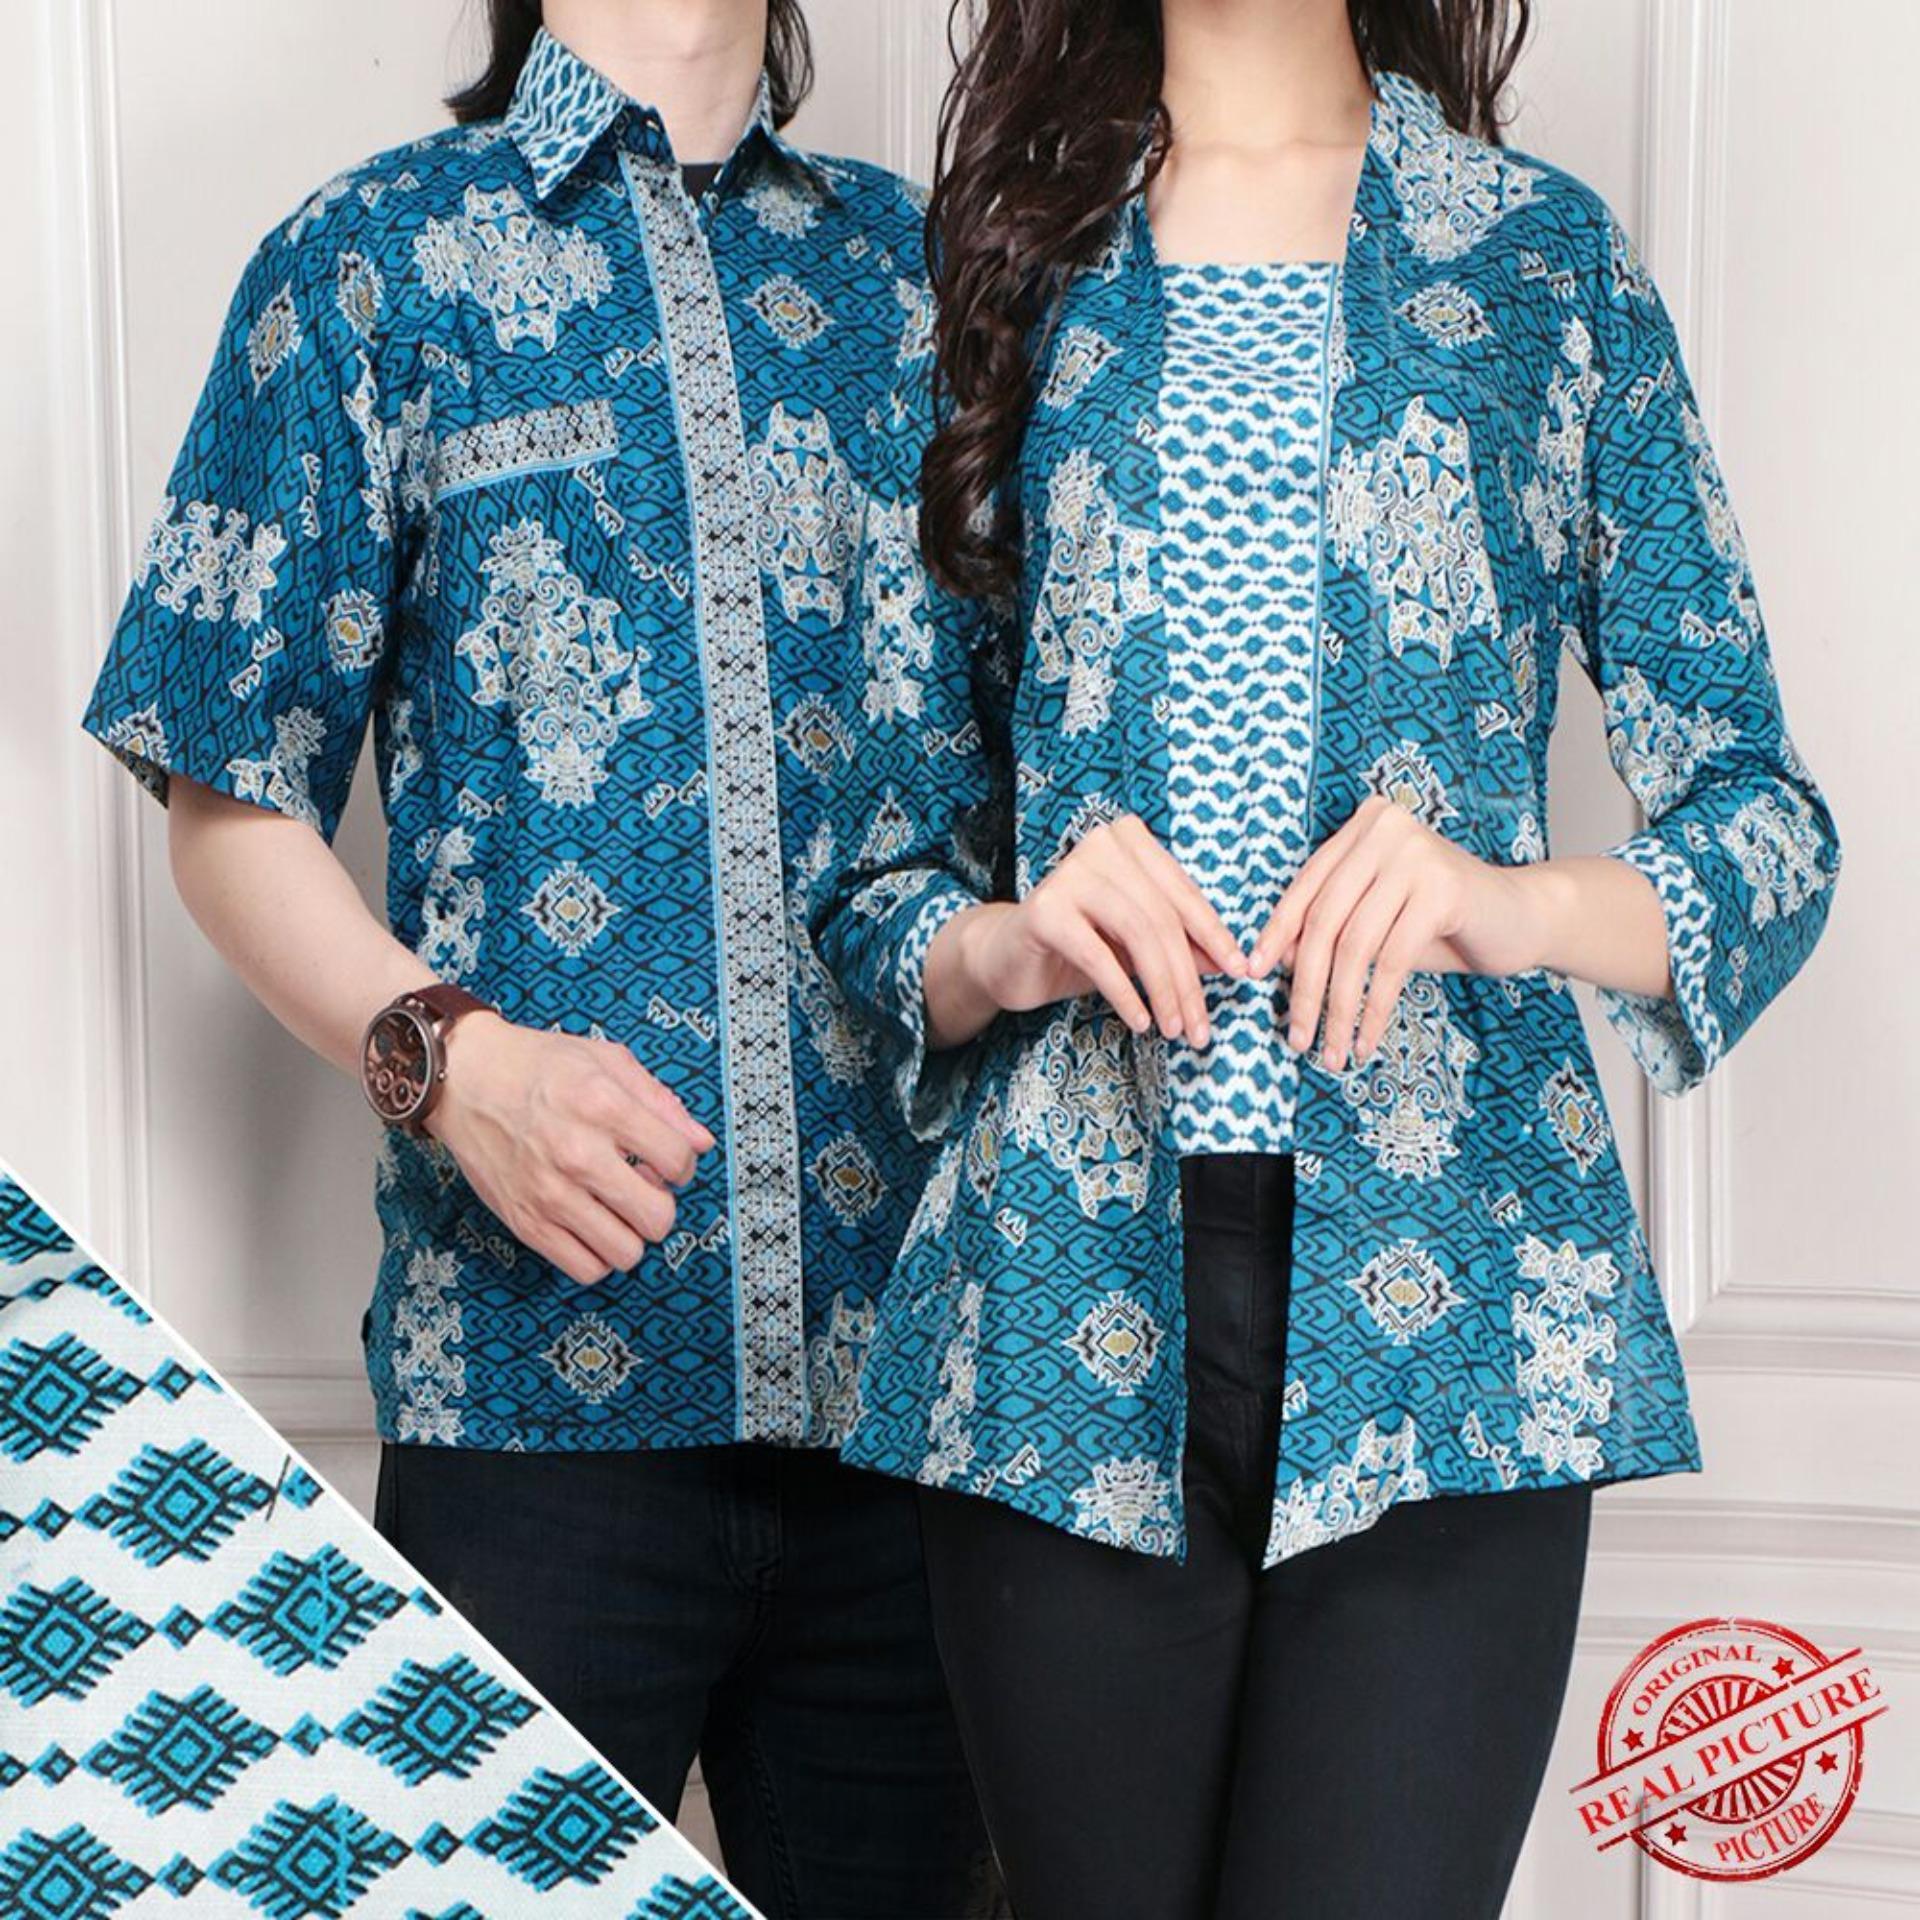 Jual Sb Collection Couple Atasan Blouse Dzikra Abaya Dan Kemeja Batik Pria Online